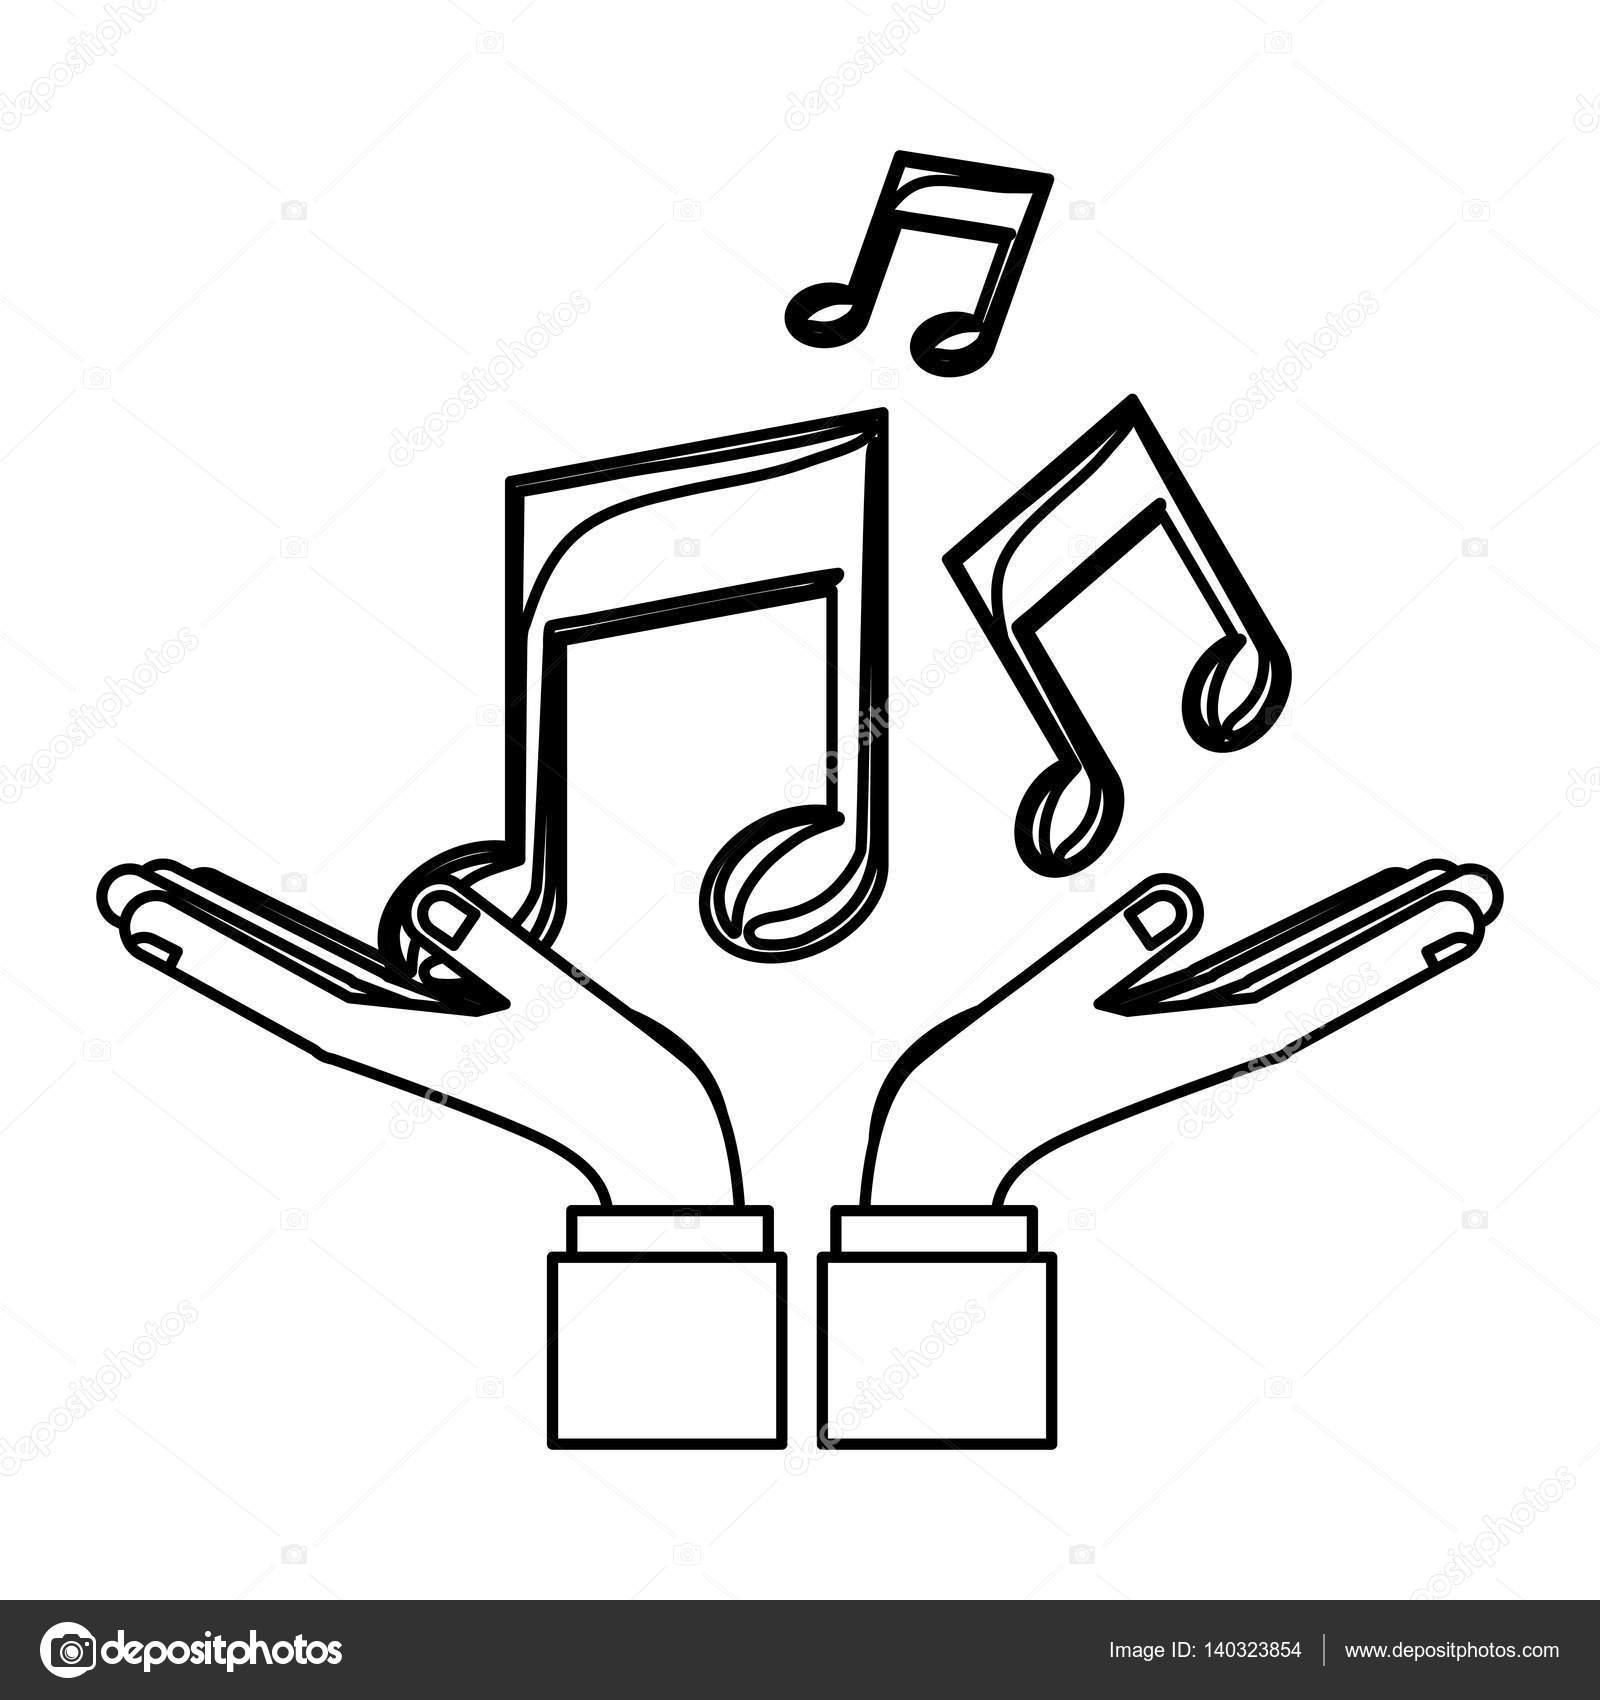 1600x1700 Music Notes Symbols Stock Vector Grgroupstock